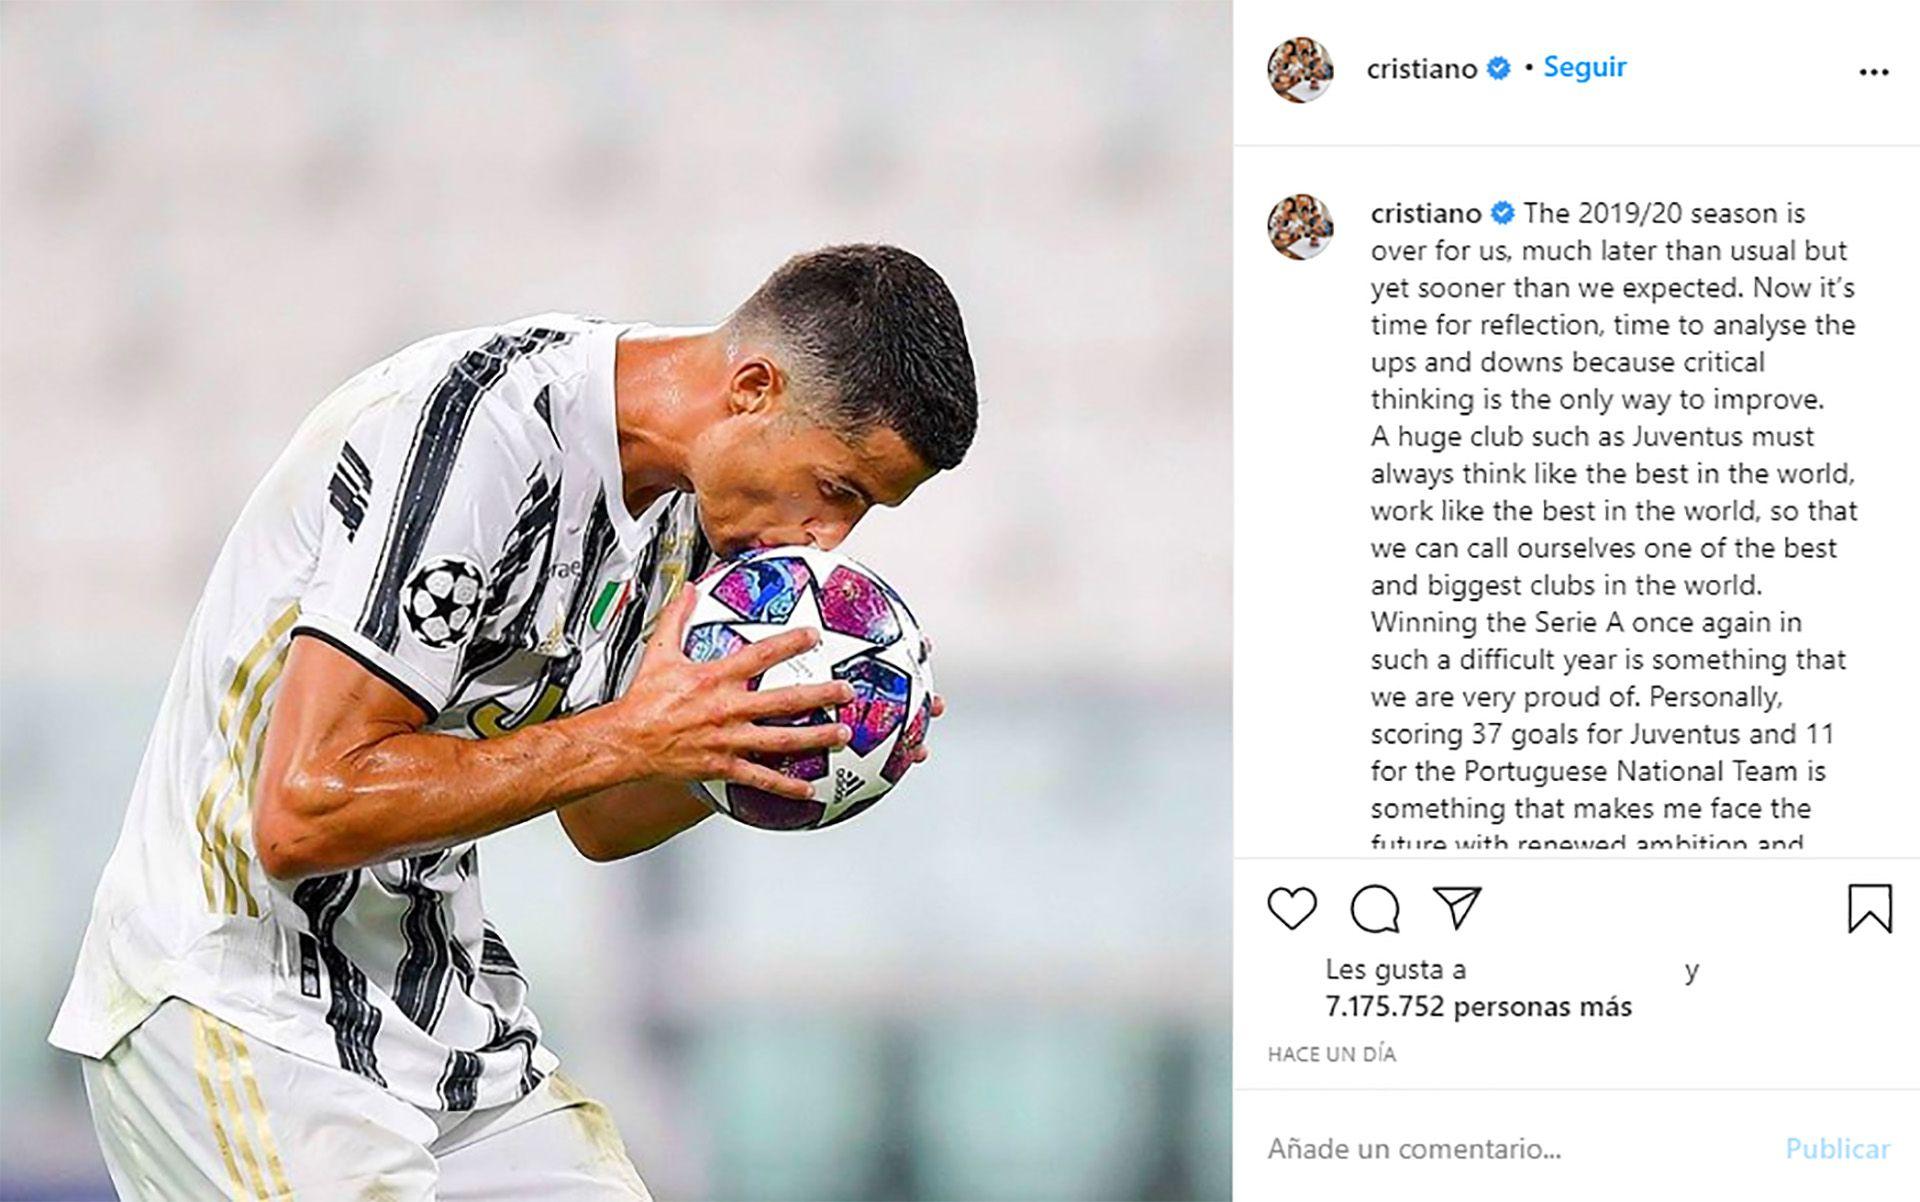 Cristiano Ronaldo IG